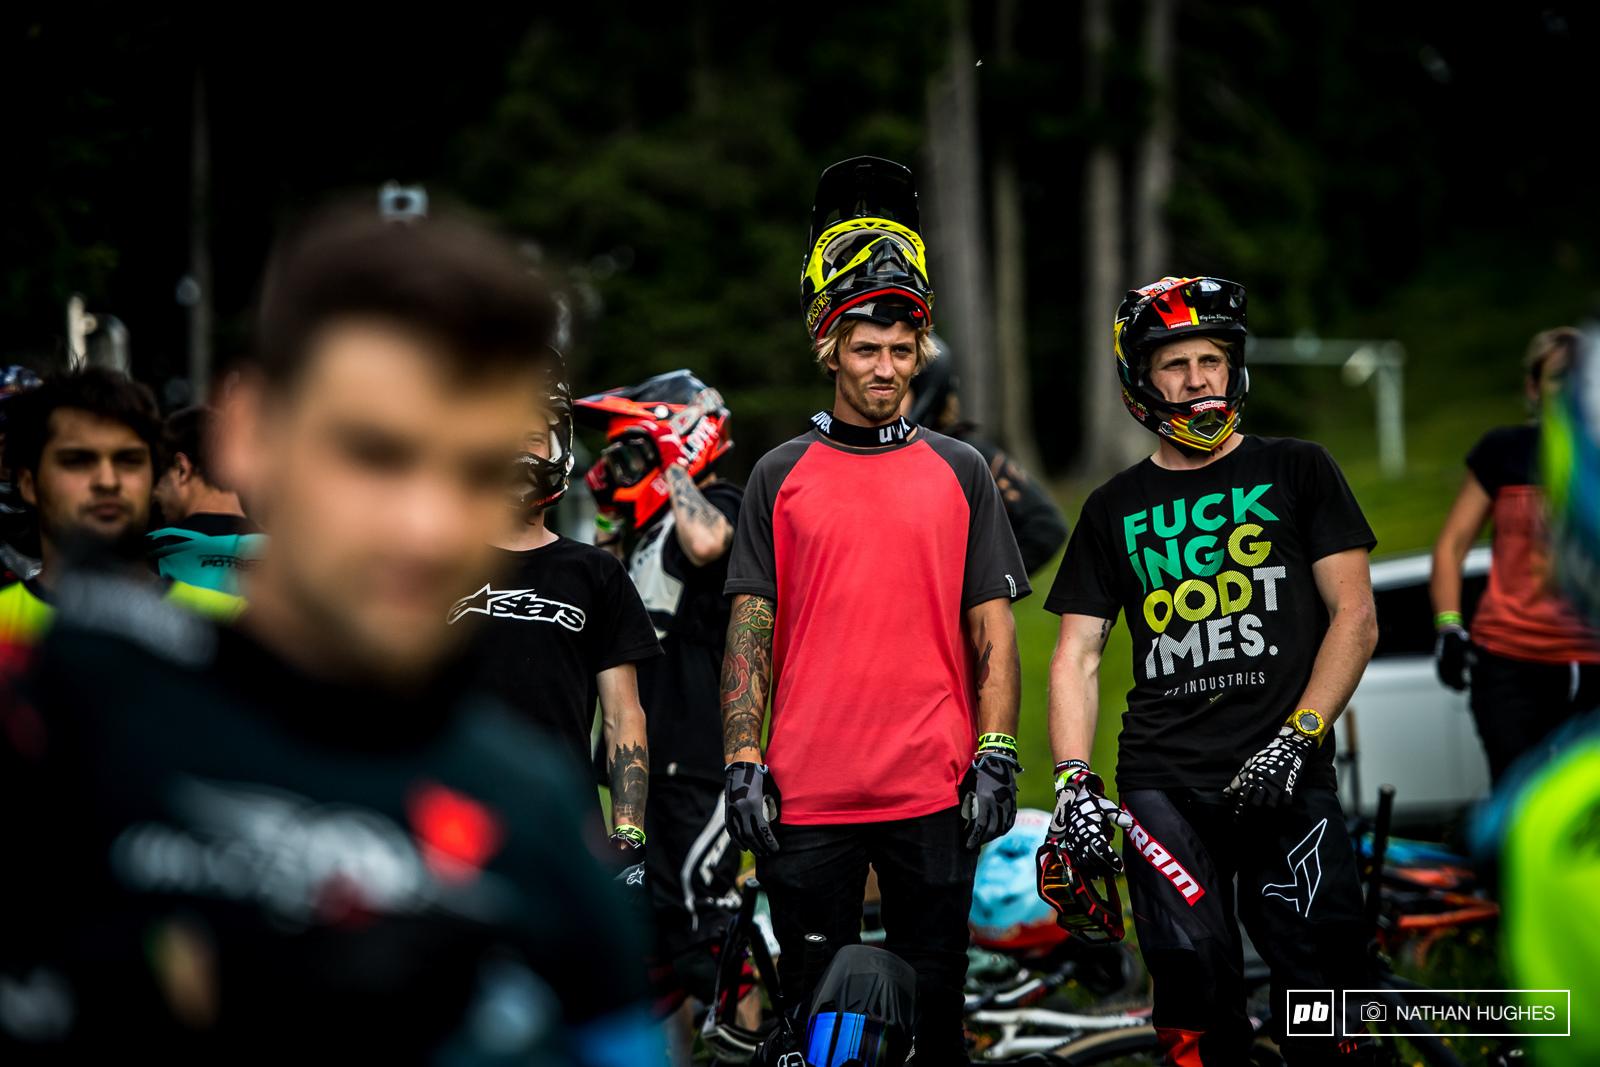 German crew represent Patrick Schweika and Erik Irmisch.